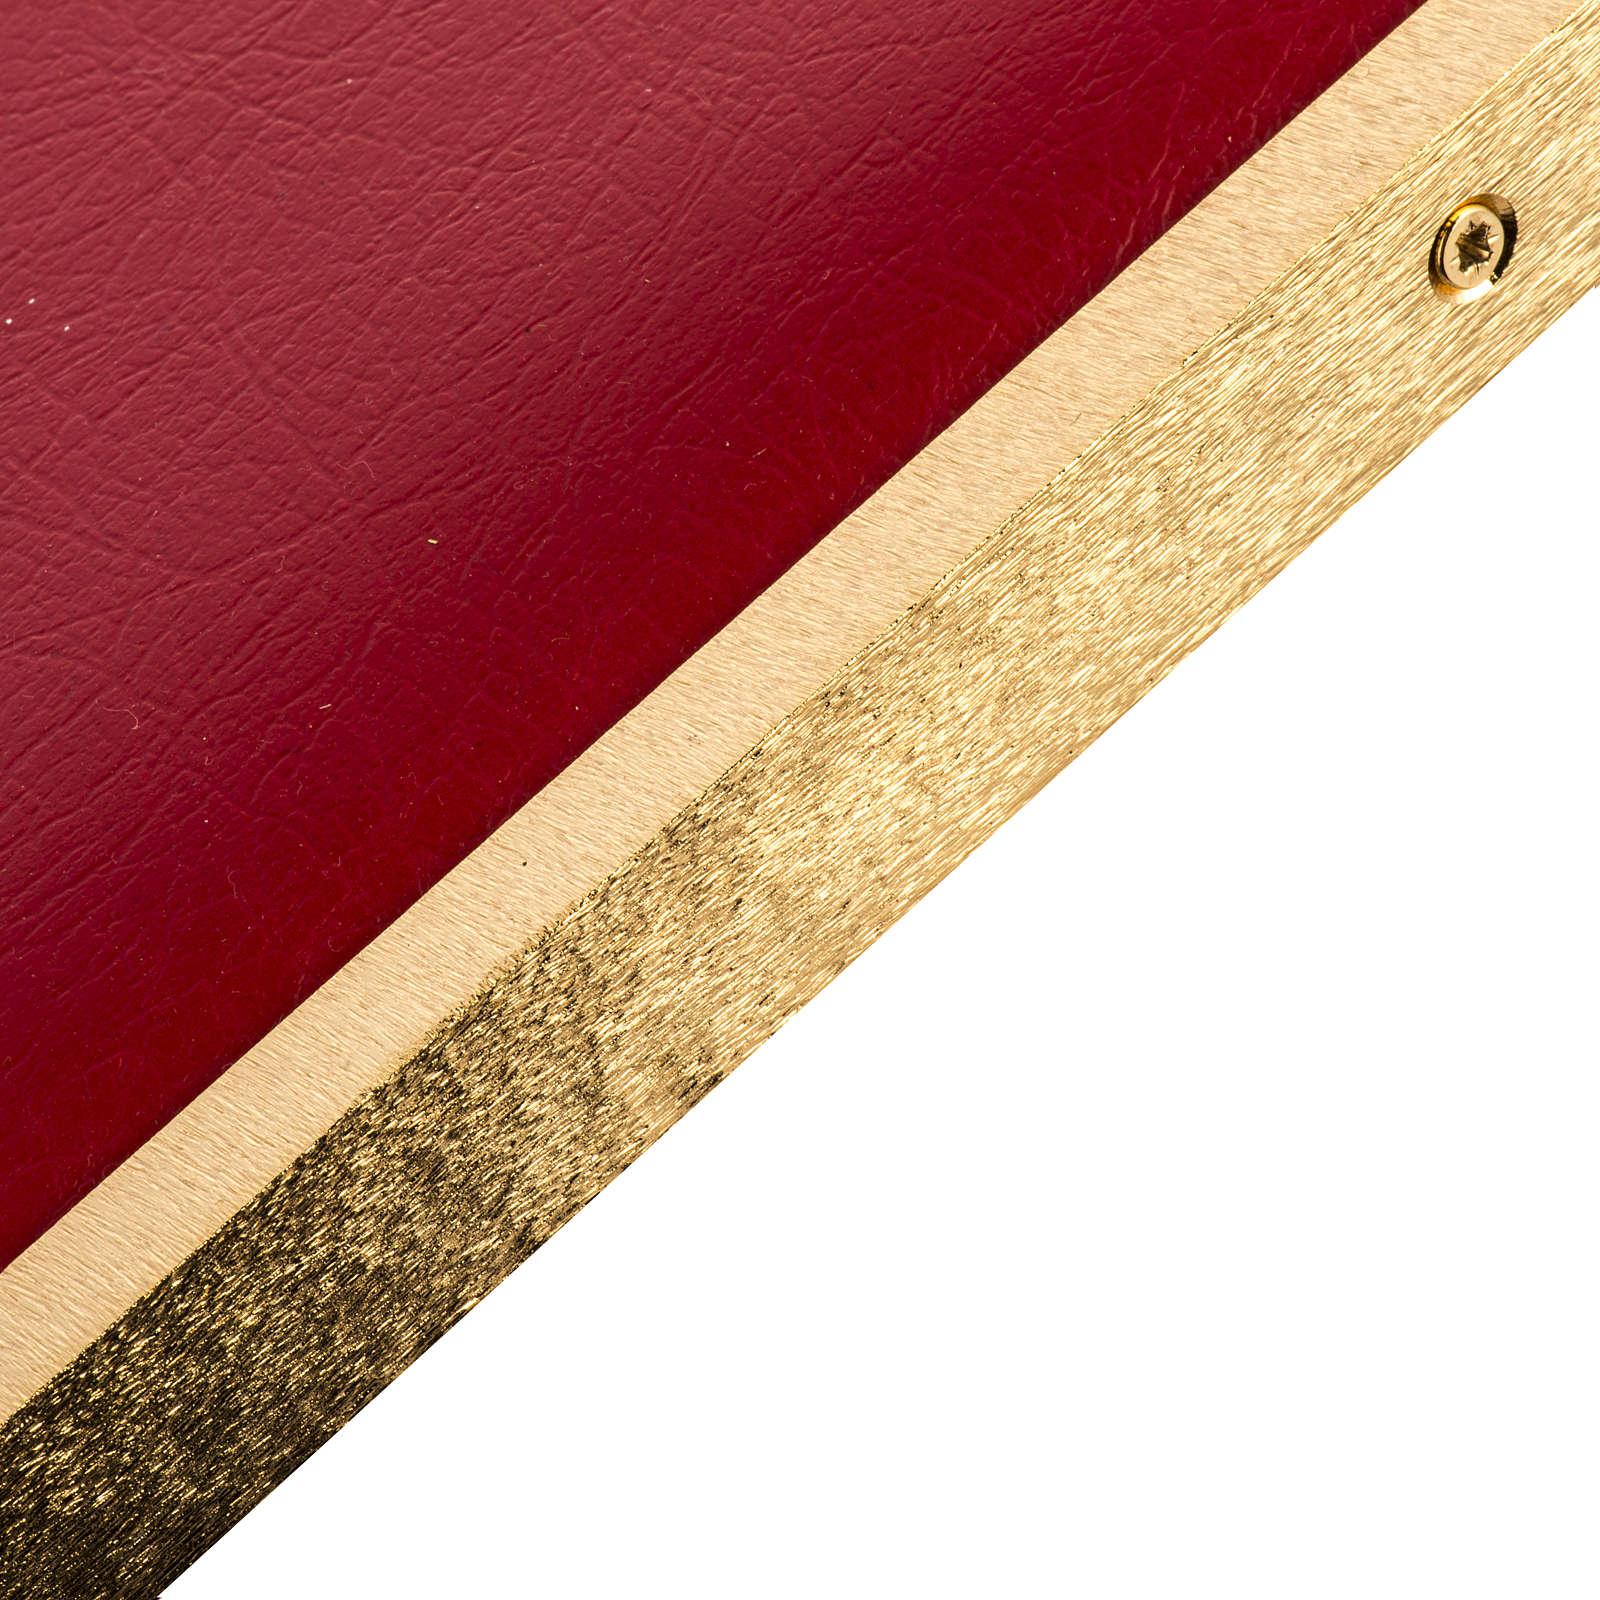 Atril de latón fundido dorado 4